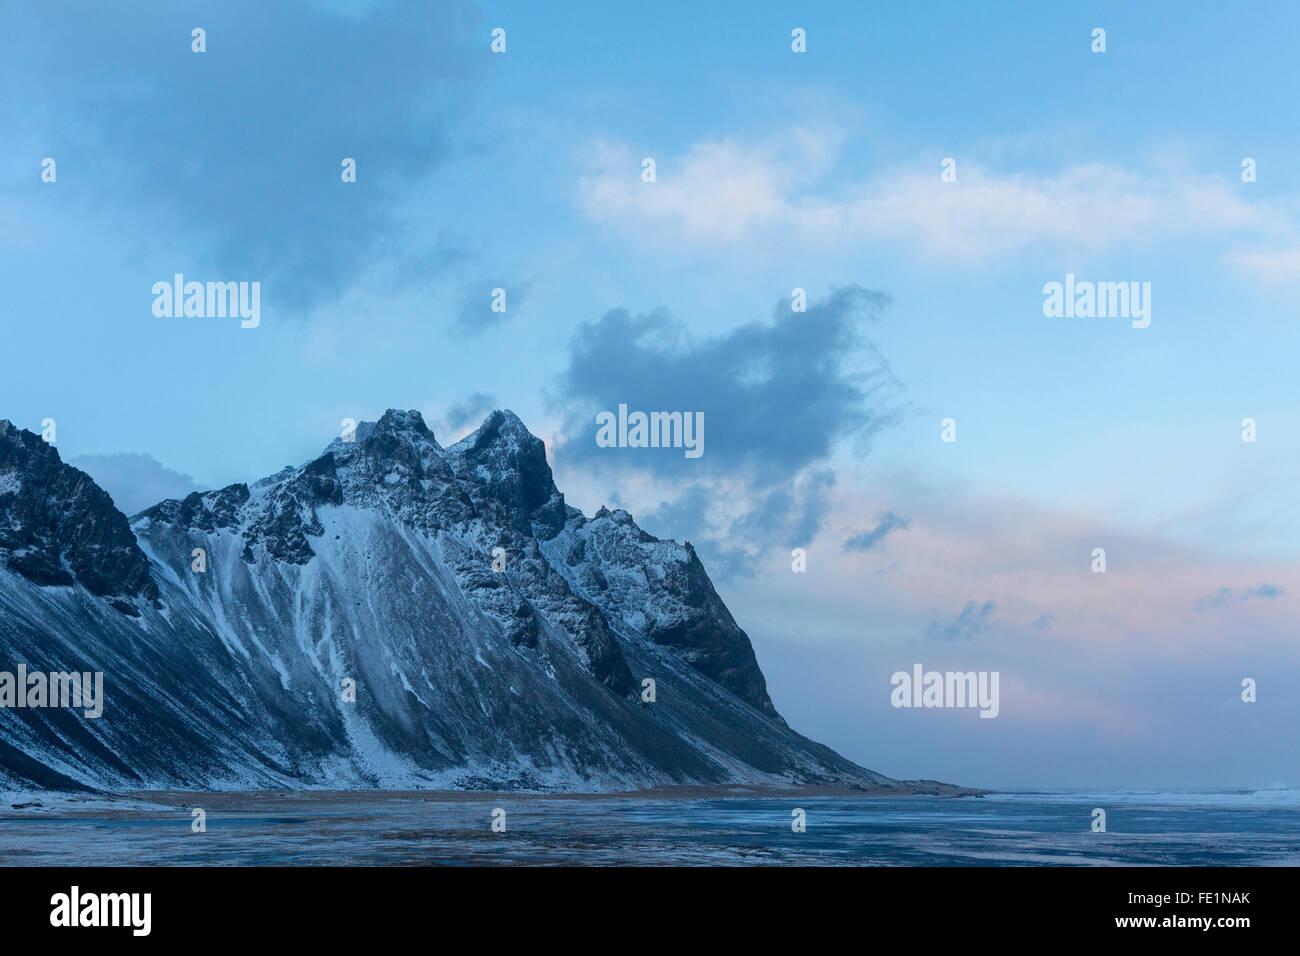 Mount Vestrahorn, Stokksnes, Iceland - Stock Image